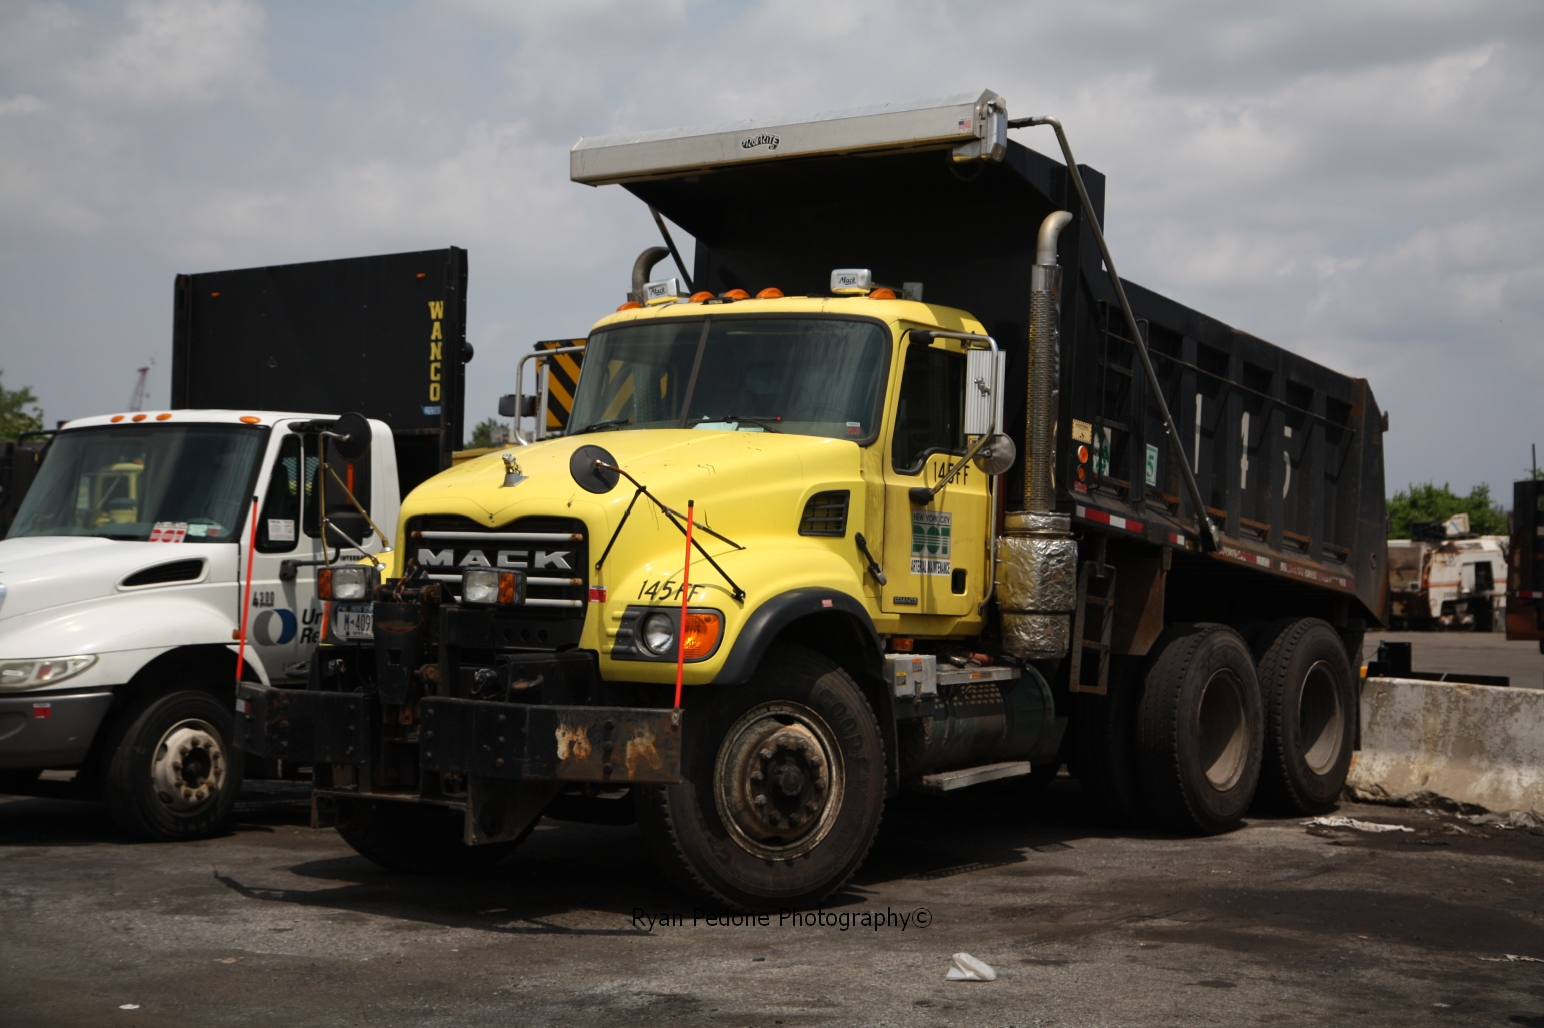 Ifa Truck Pics Hd: TopWorldAuto >> Photos Of Mack Granite